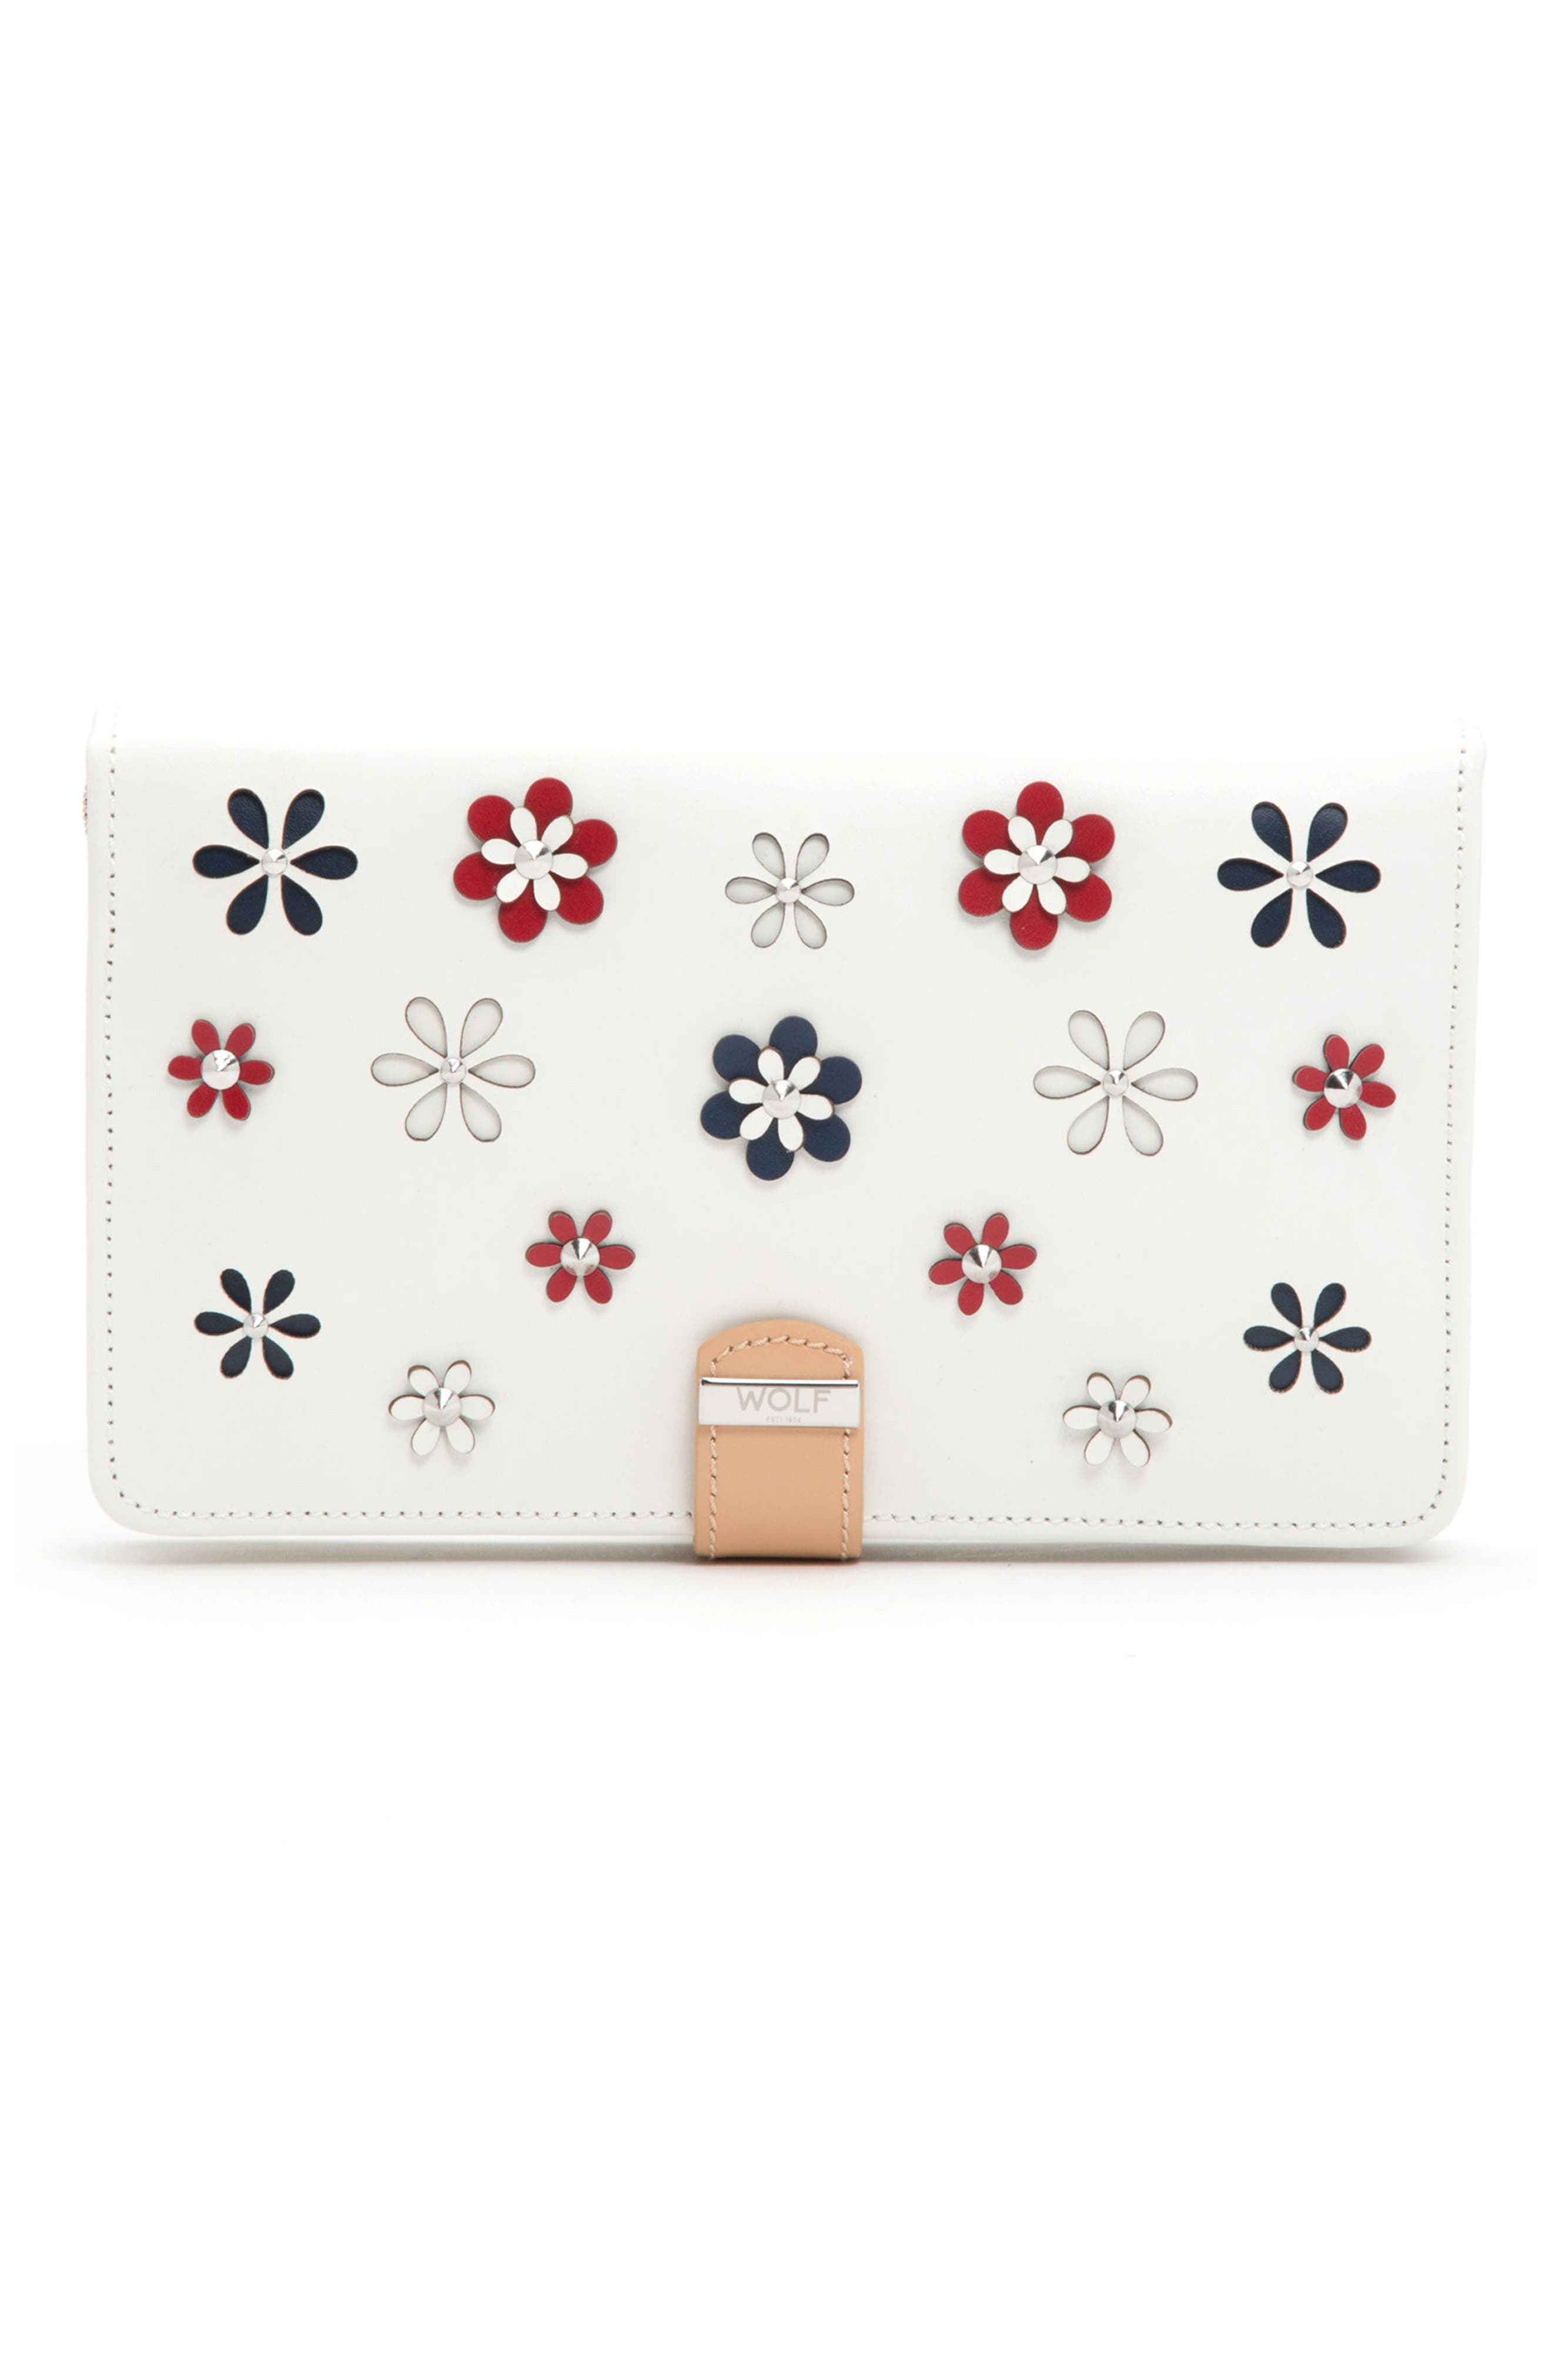 Blossom Leather Jewelry Portfolio,                             Main thumbnail 1, color,                             IVORY